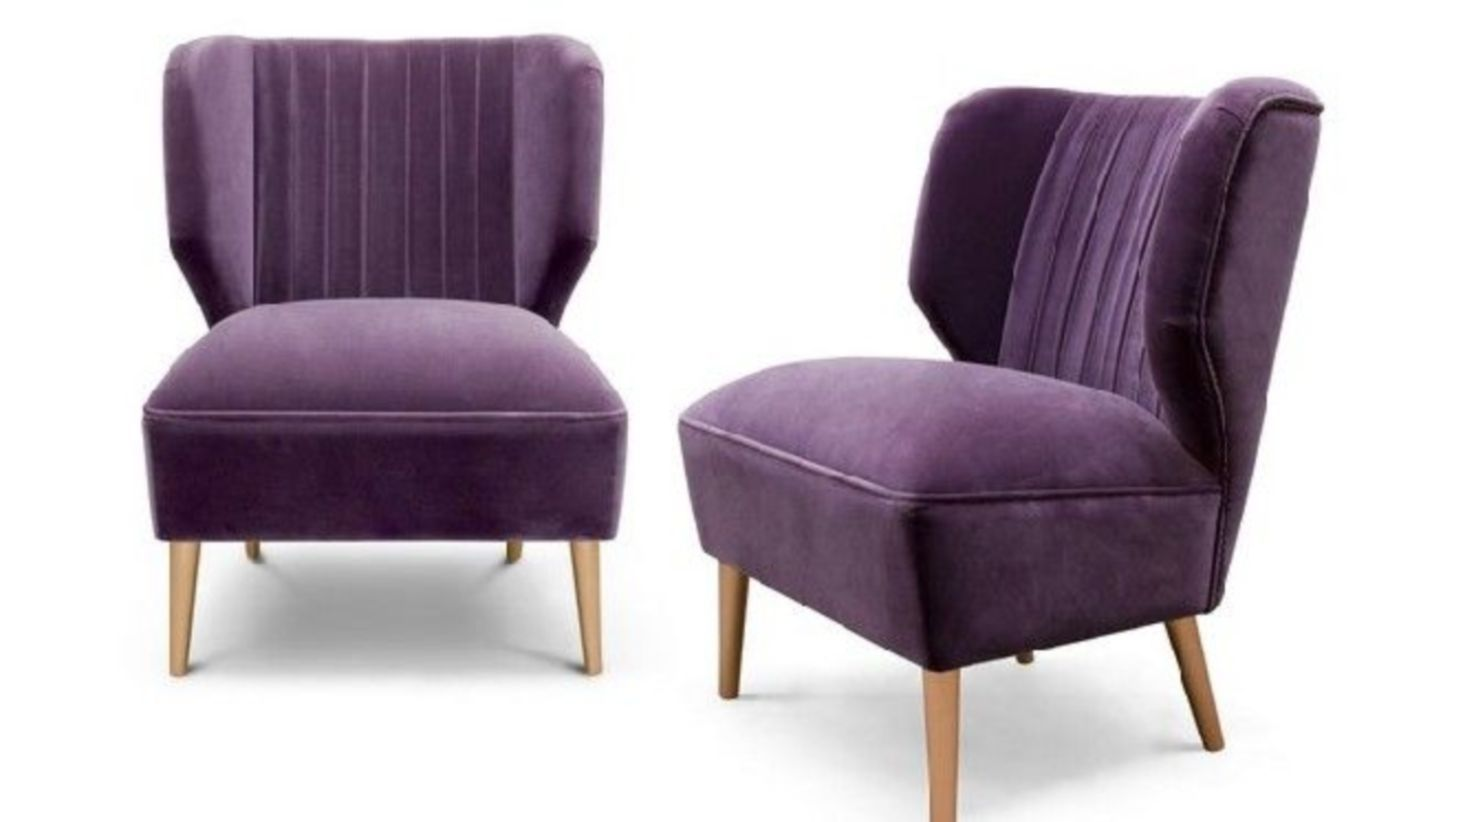 Classic Single Sofa Classic Sofa Designs Pictures Fedisa Sofa